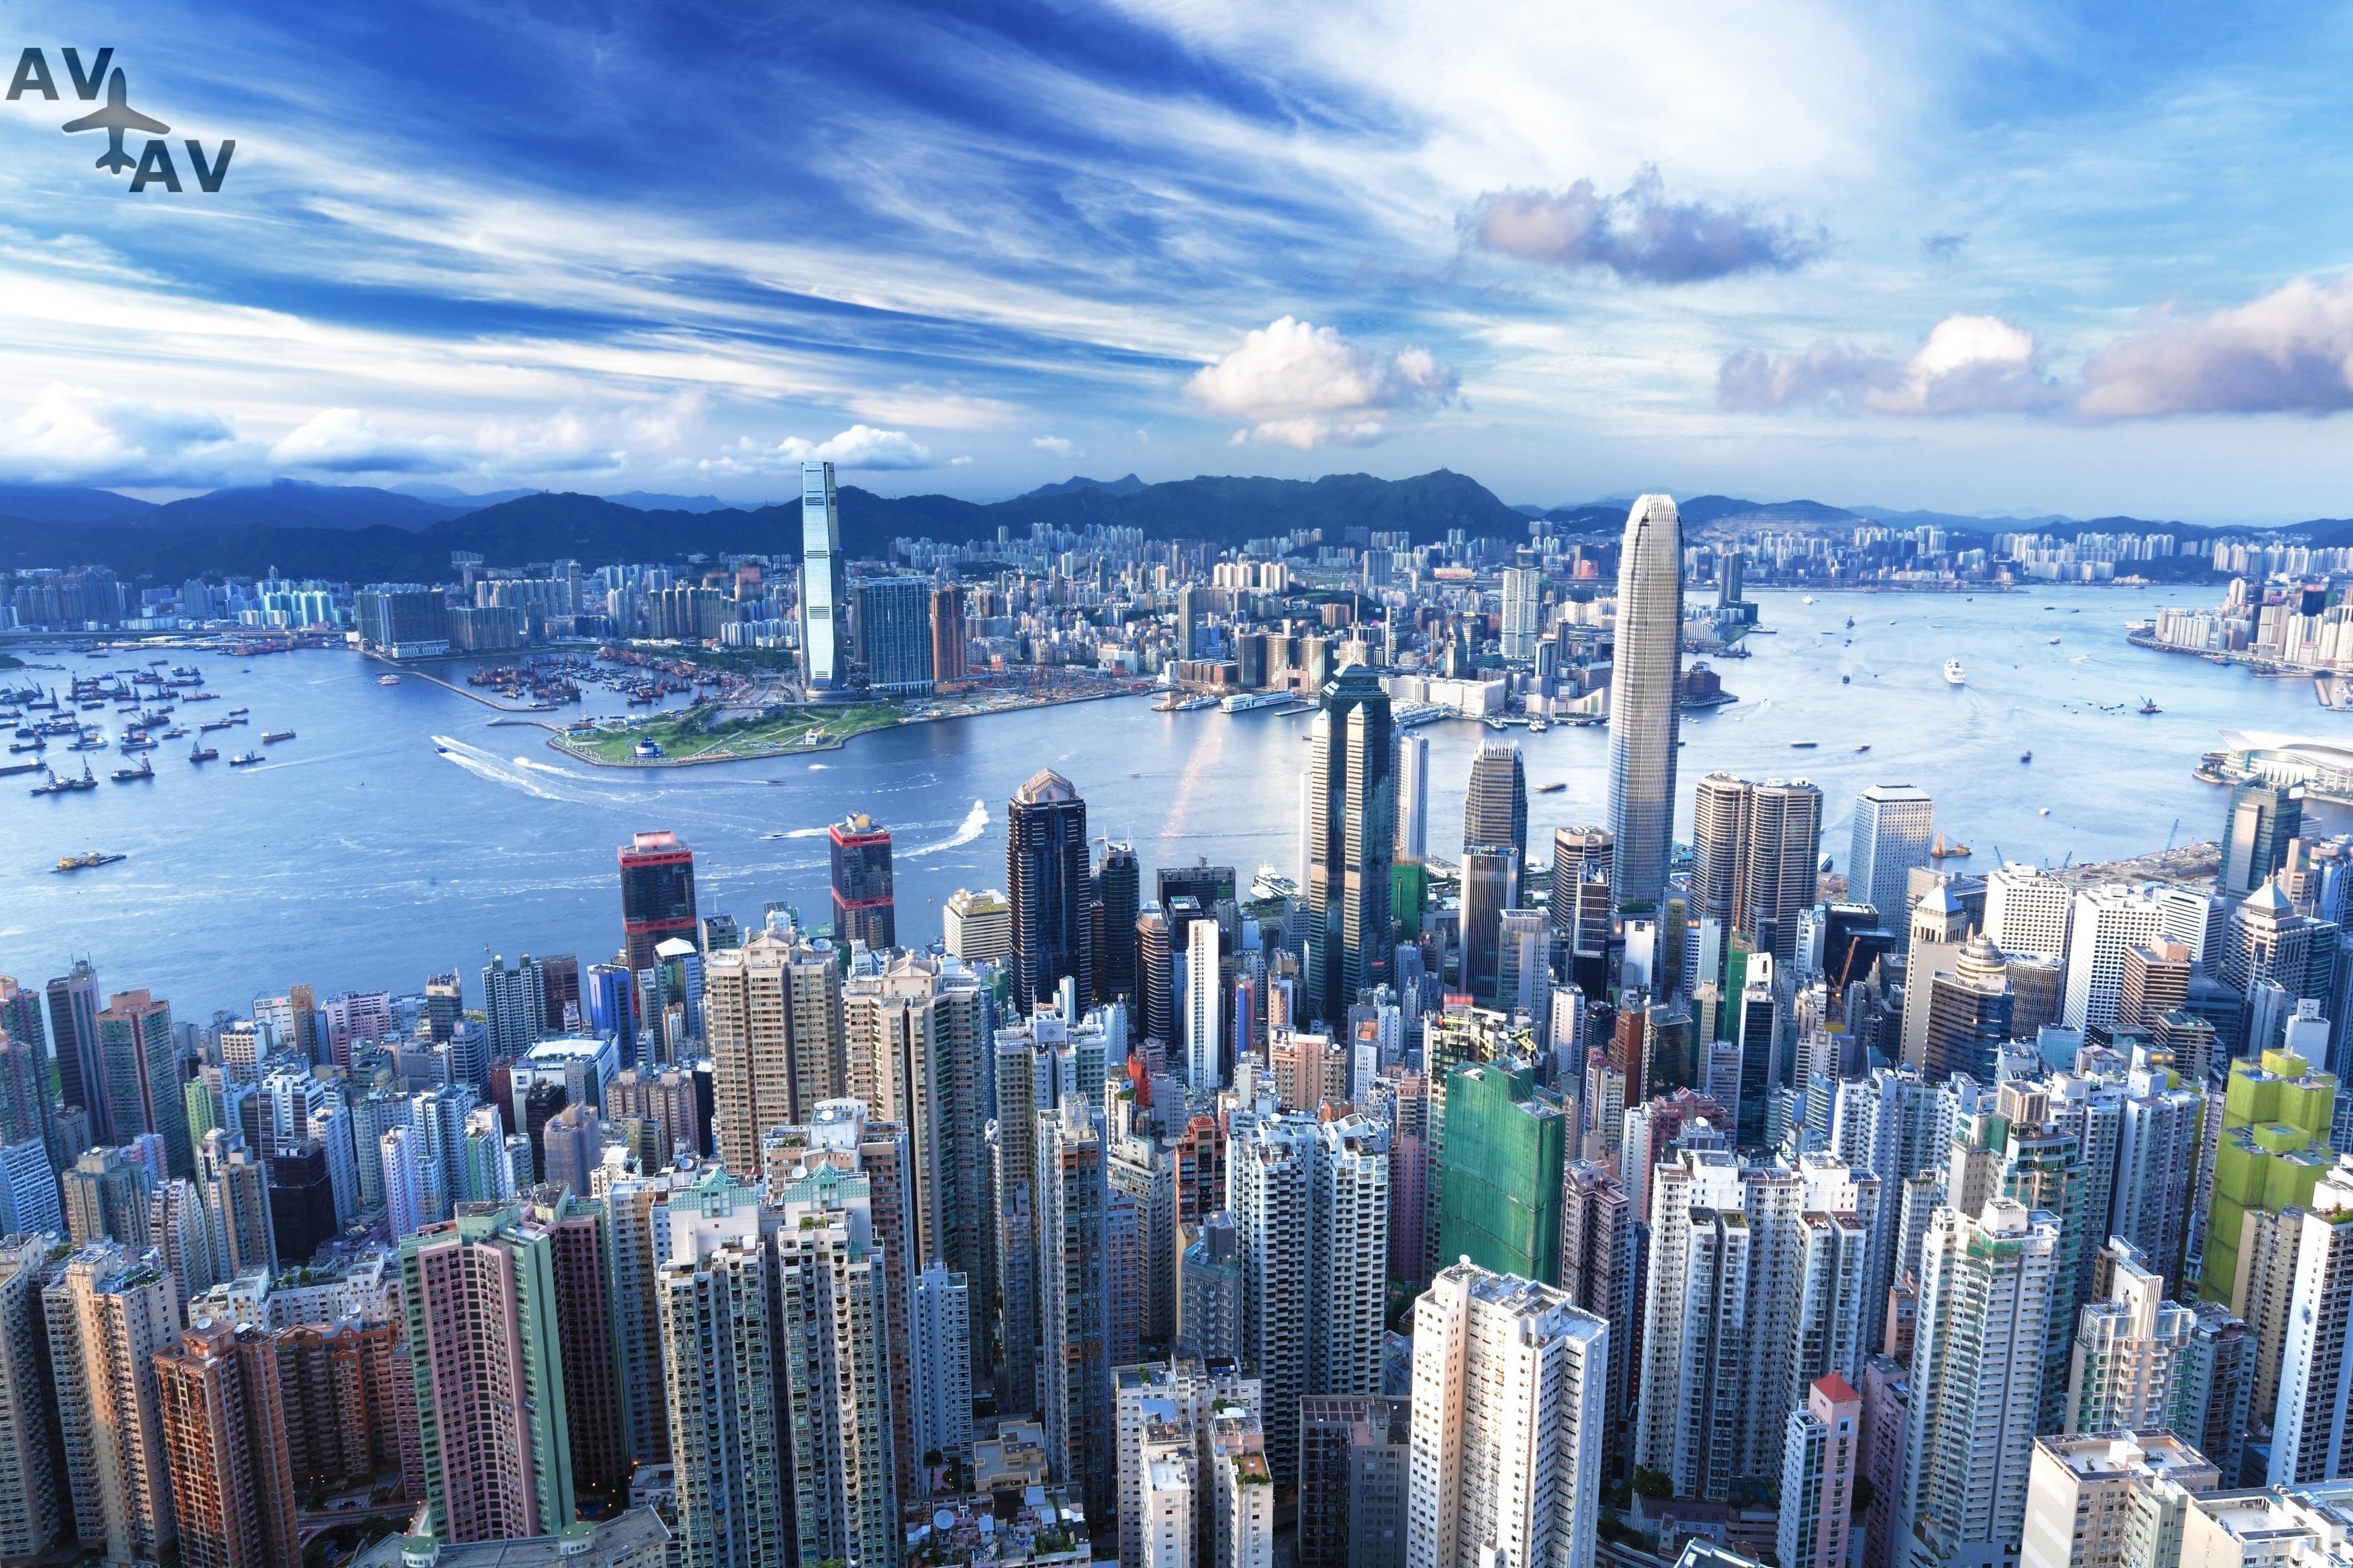 Gonkong territoriya zhizni - Гонконг - территория жизни